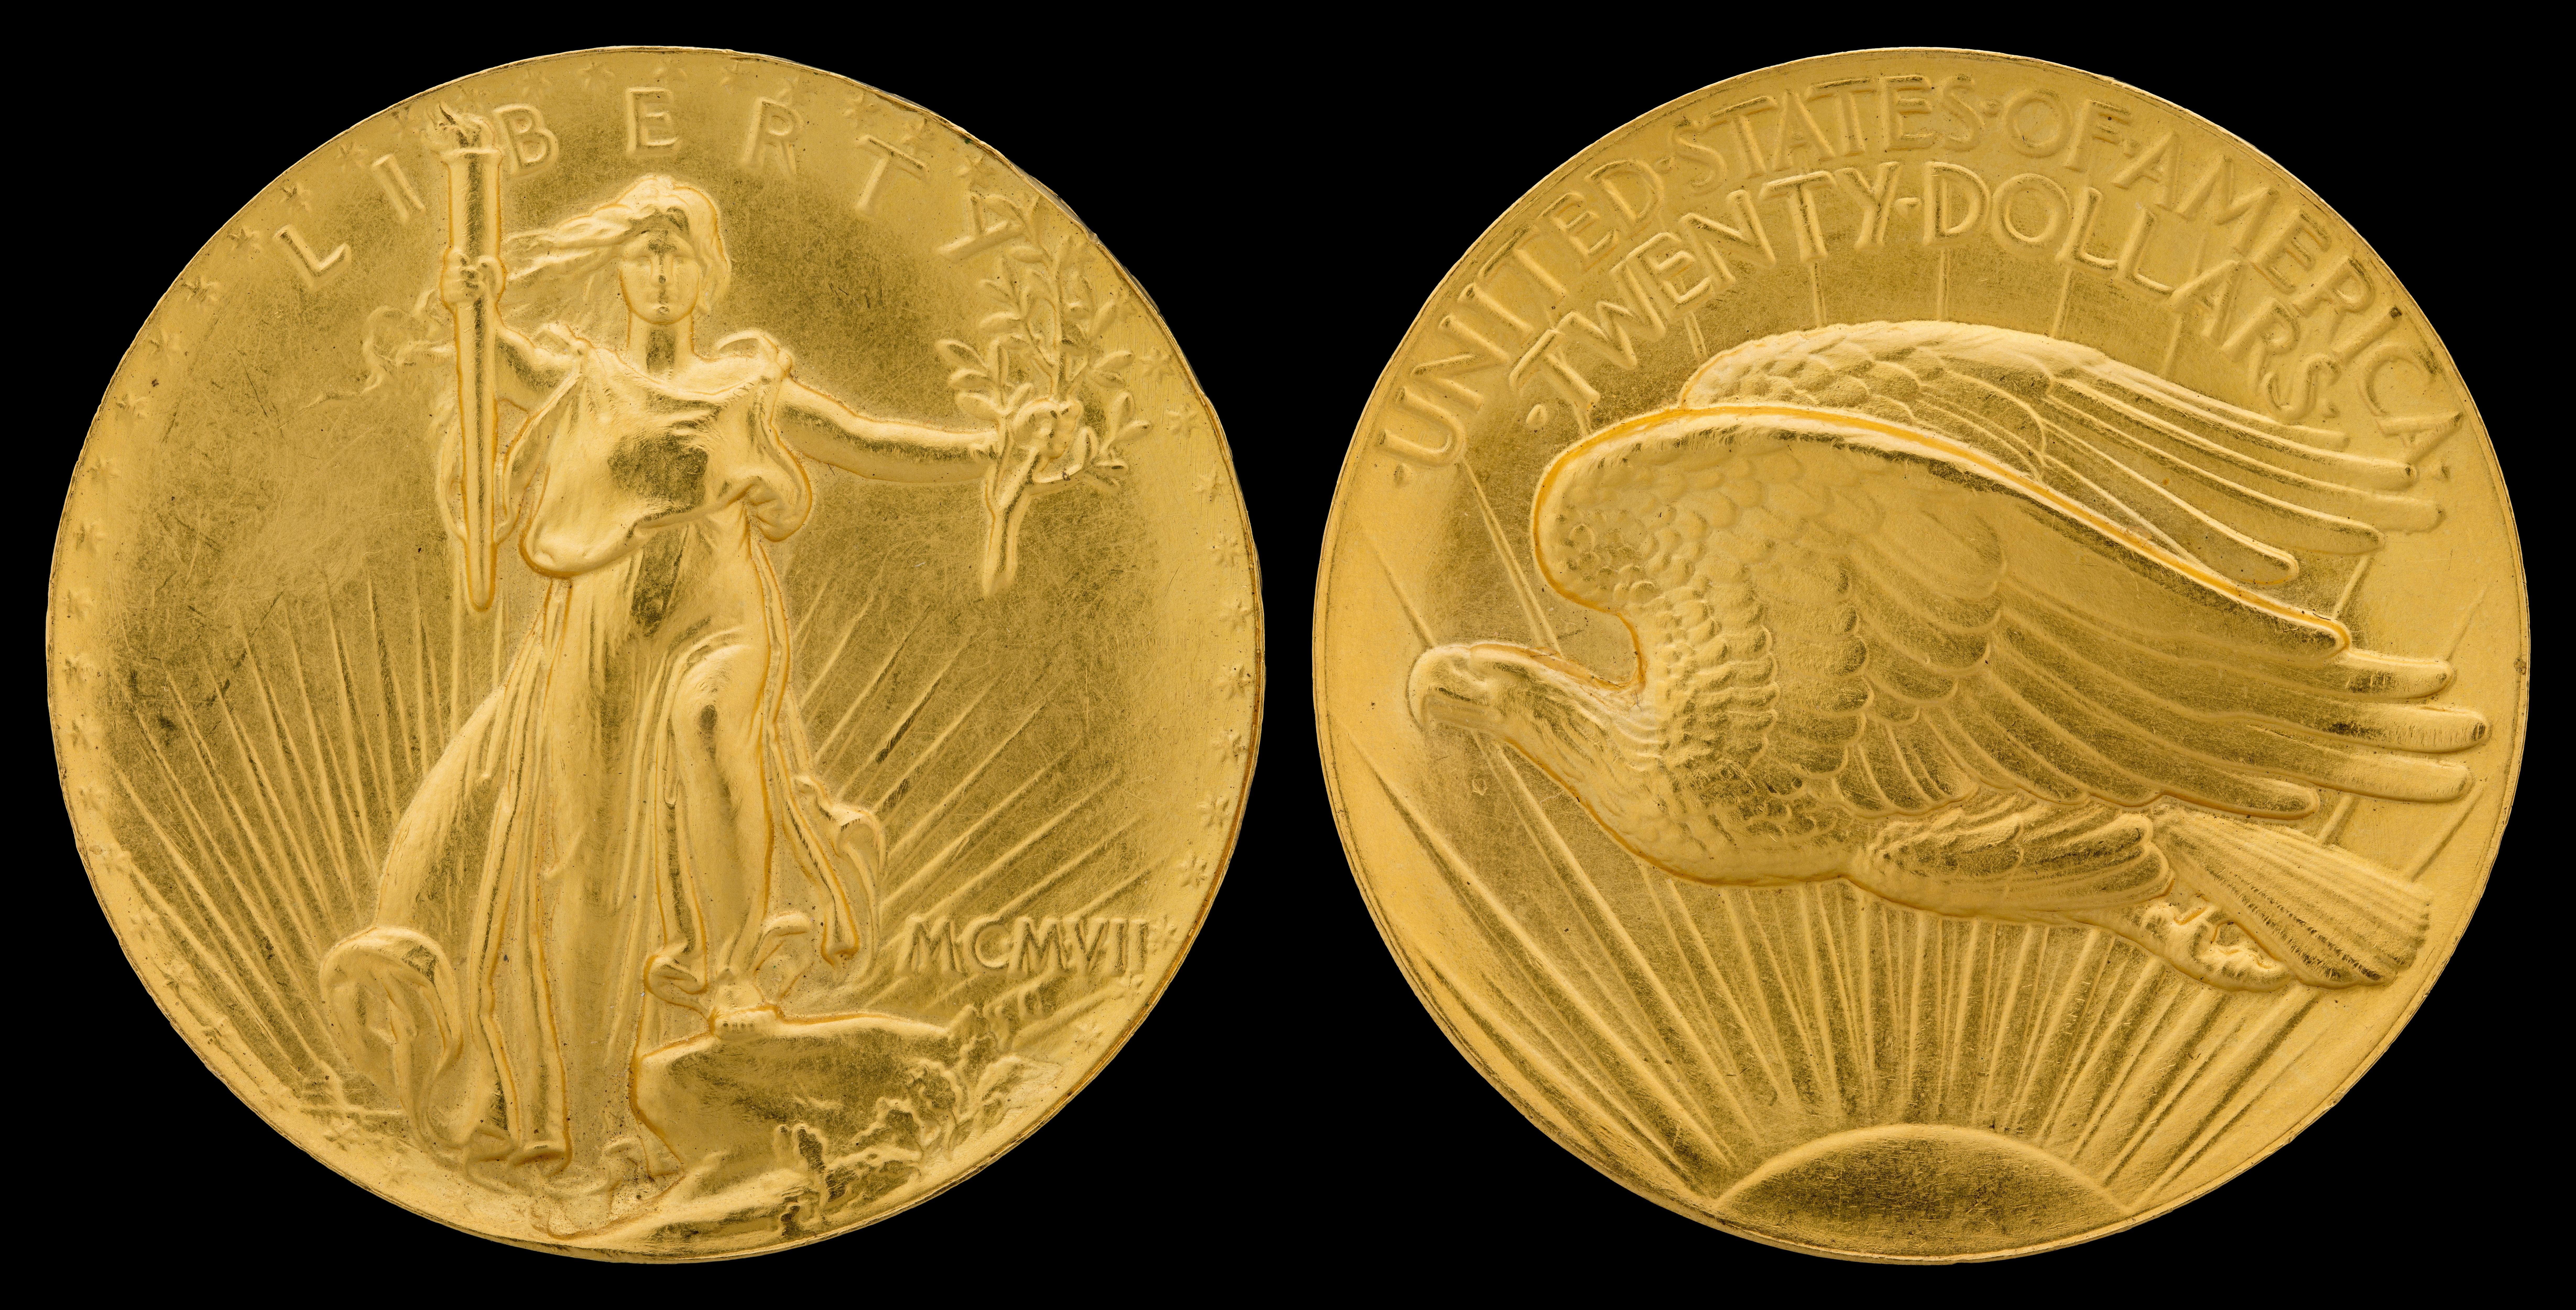 2 1/2 dollar gold coin 1928 value